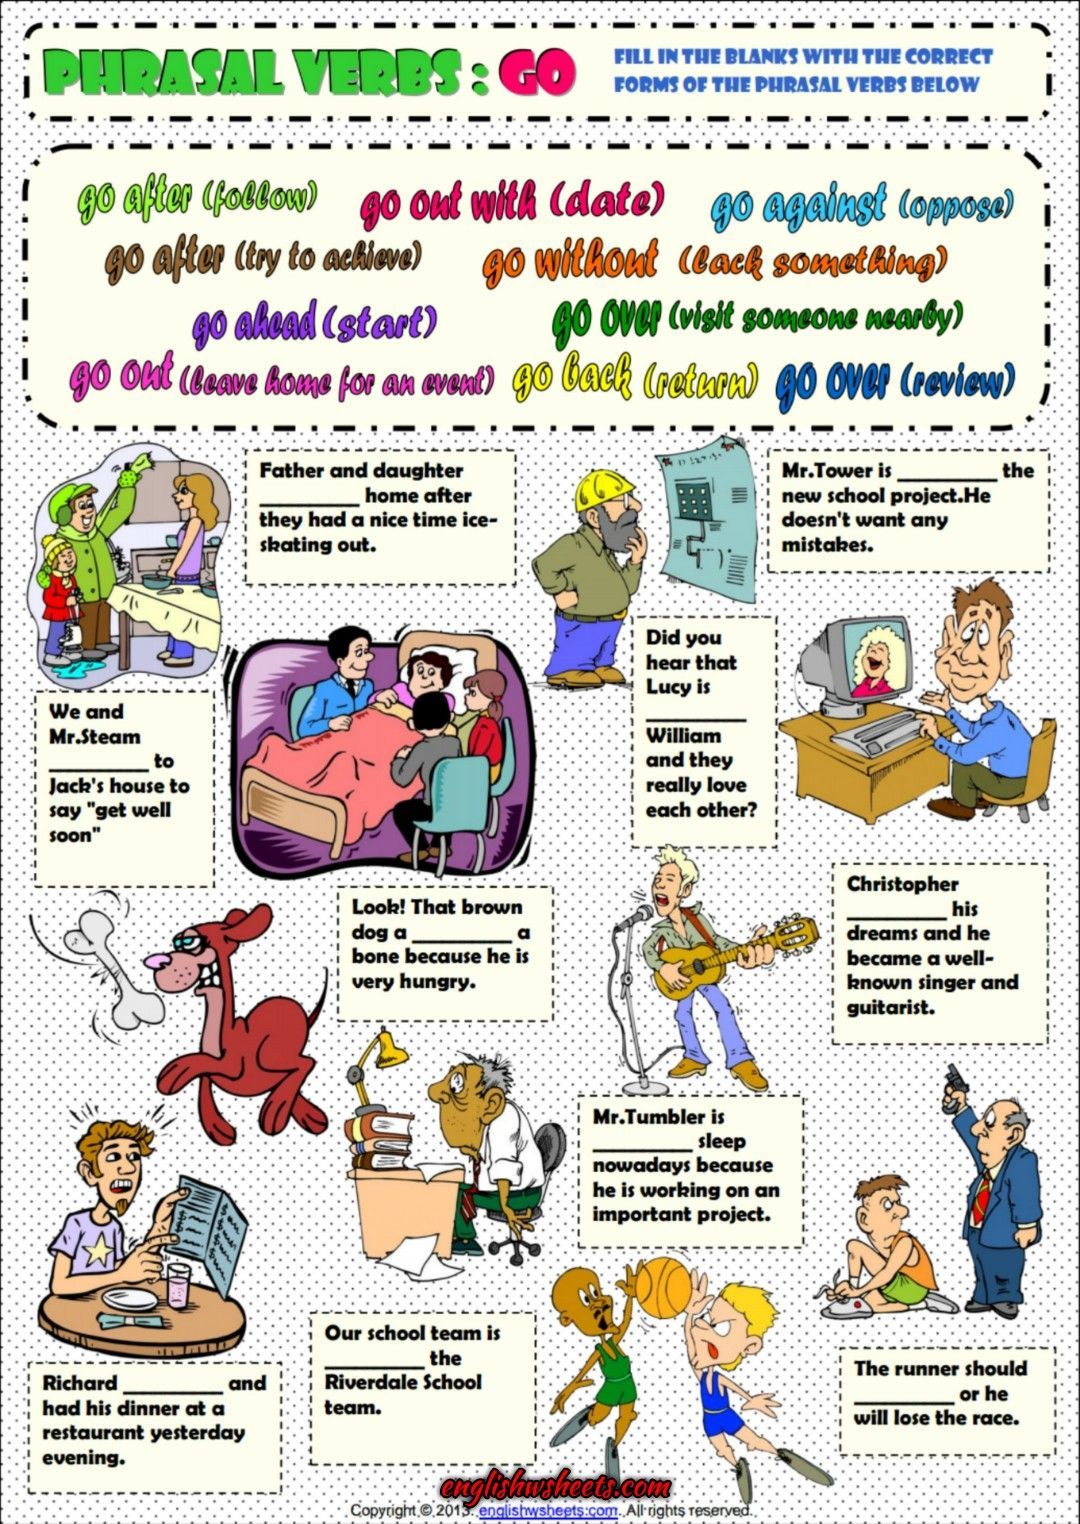 Phrasal Verbs With Go Esl Grammar Exercise Worksheet Teaching Verbs Vocabulary Worksheets English Primary School [ 1524 x 1080 Pixel ]